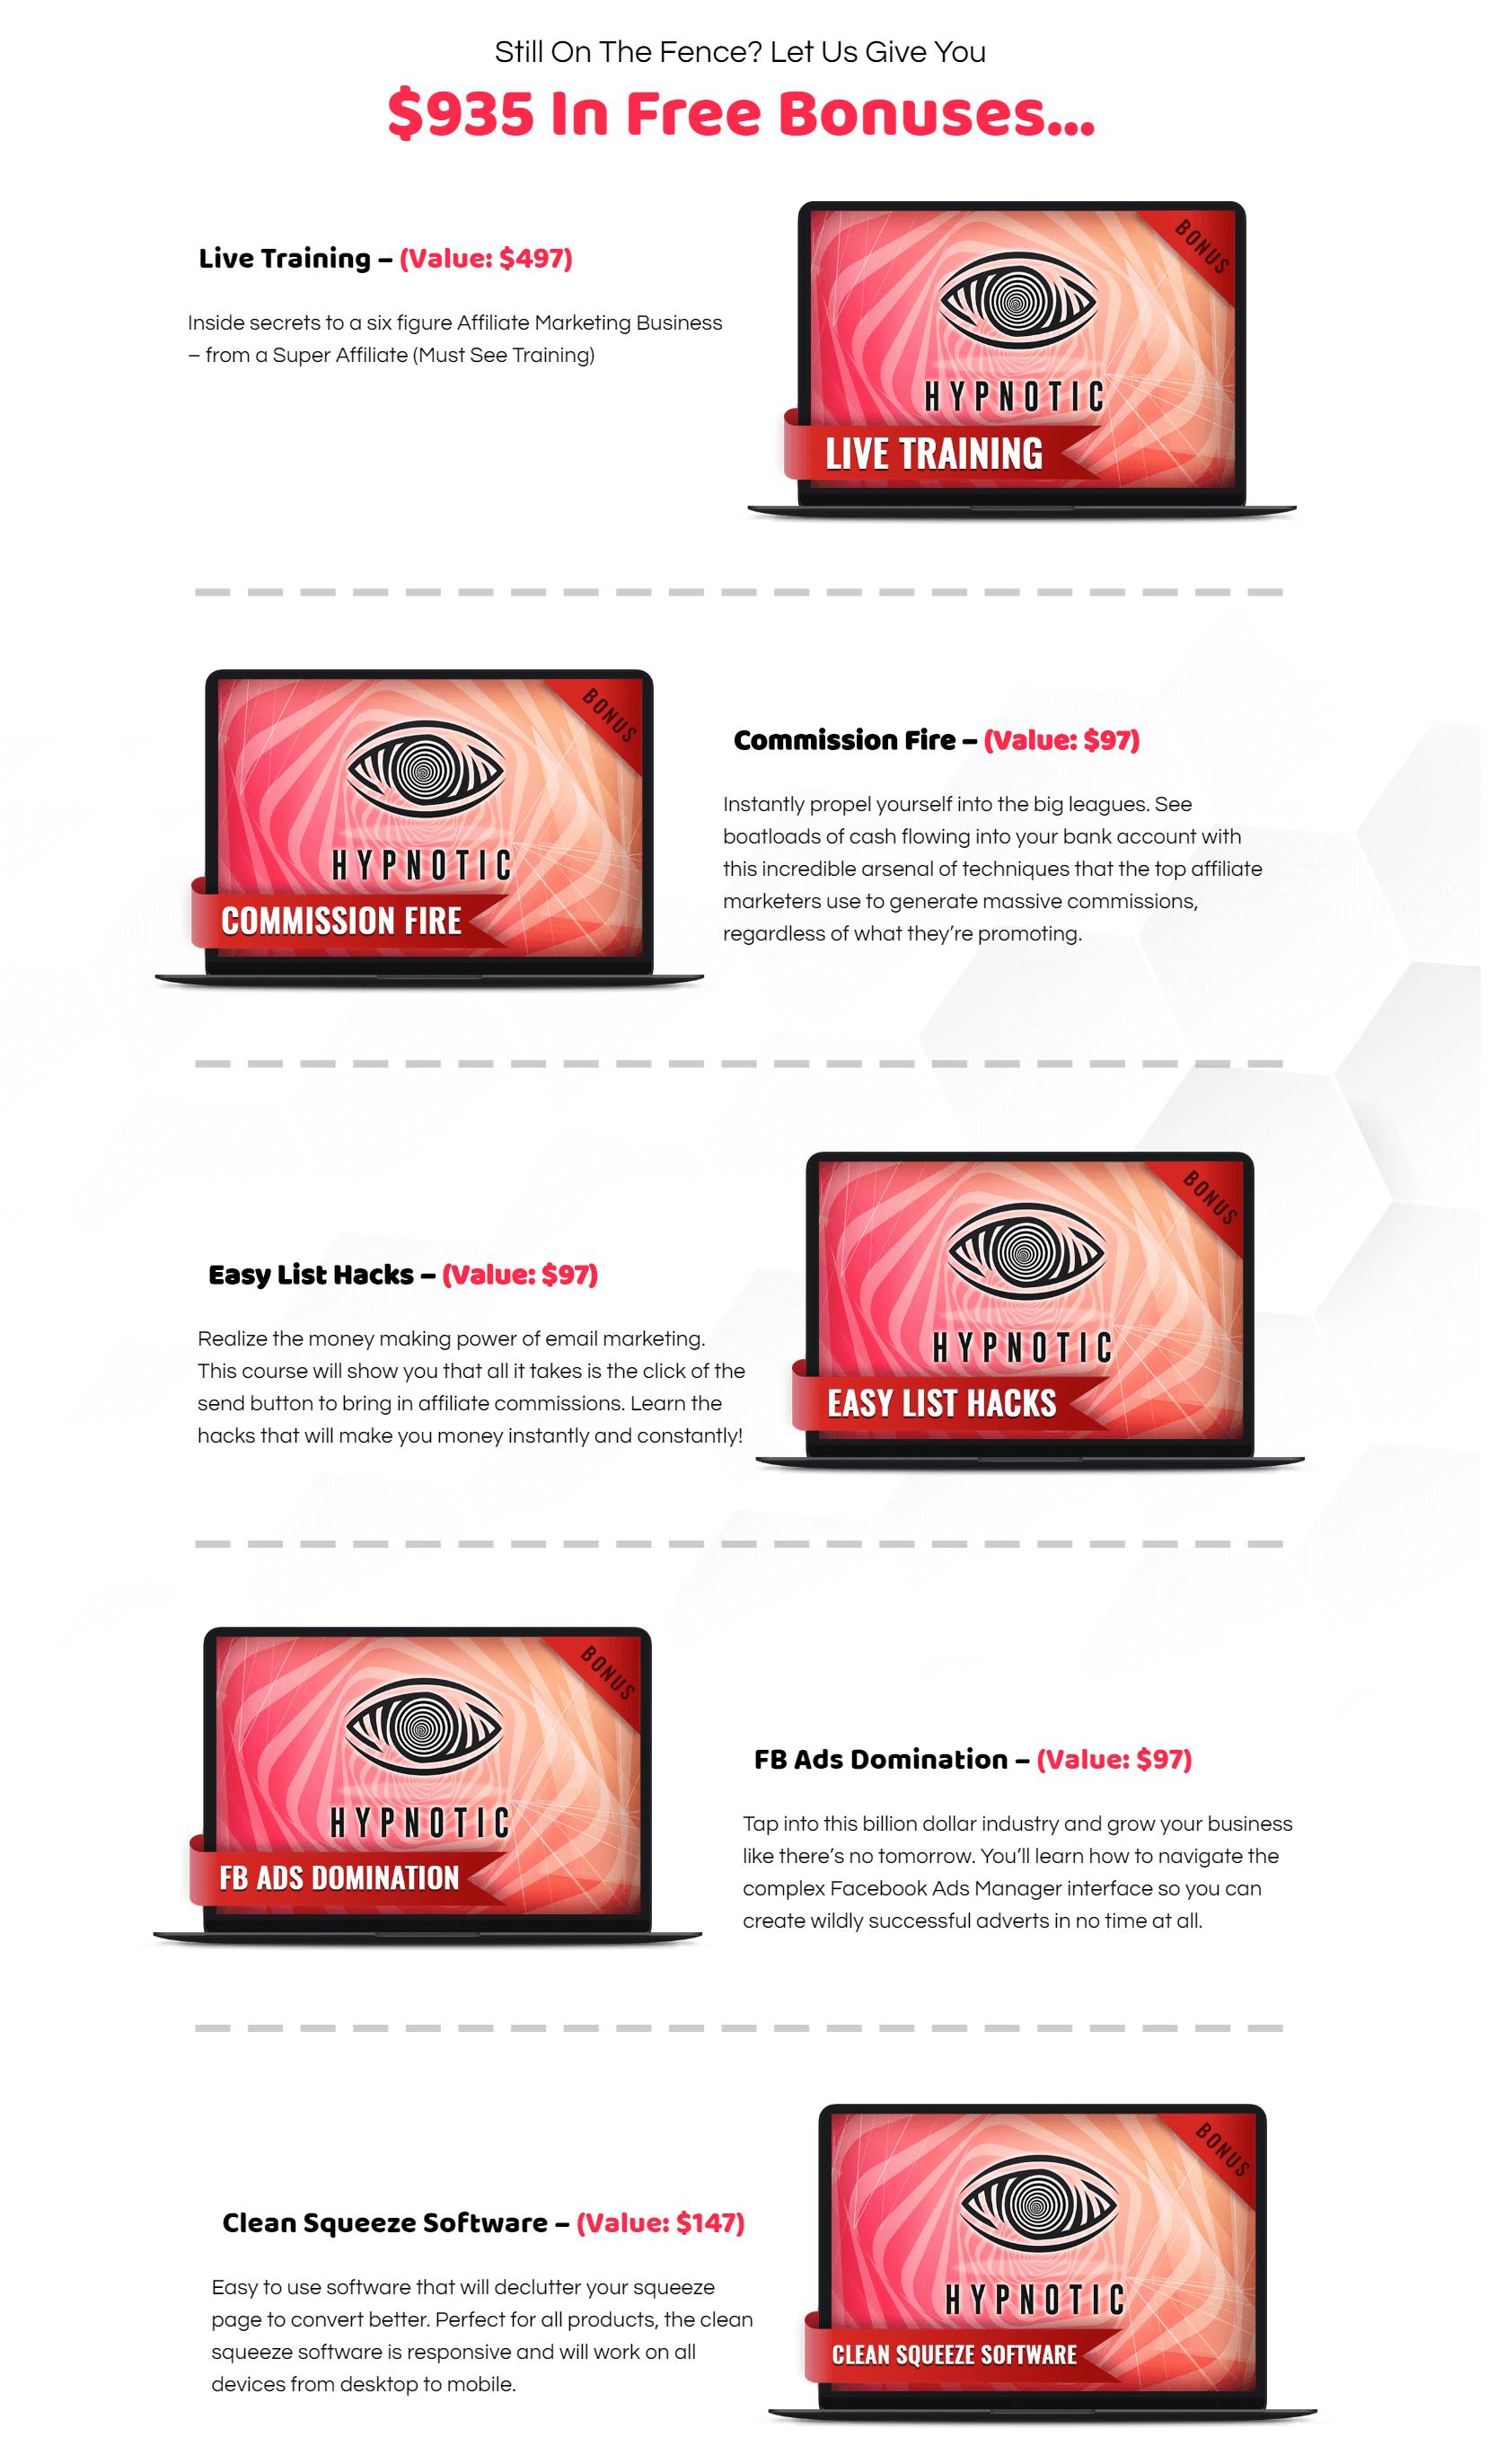 Hypnotic-Review-Bonuses